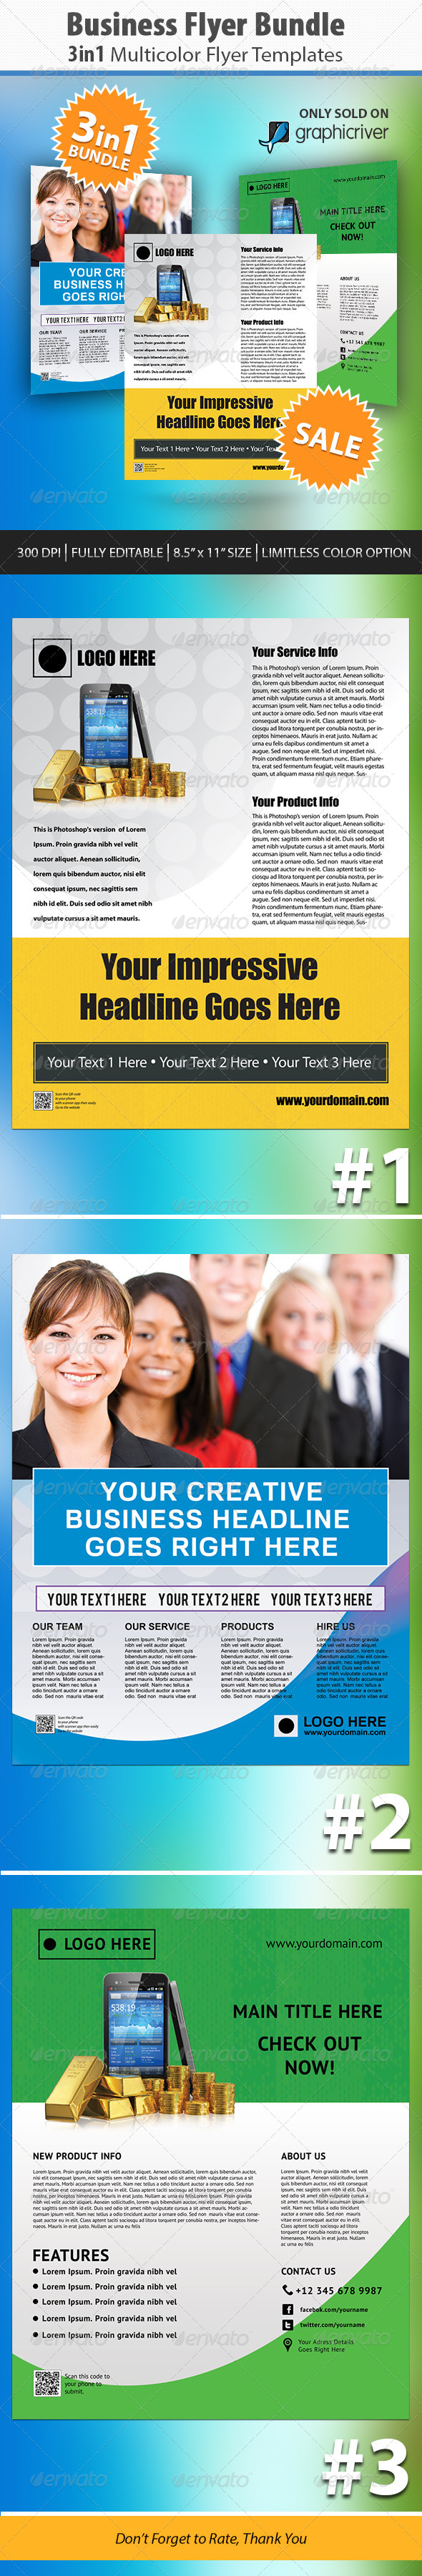 Colorful Corporate Business Flyer Bundle - Corporate Flyers